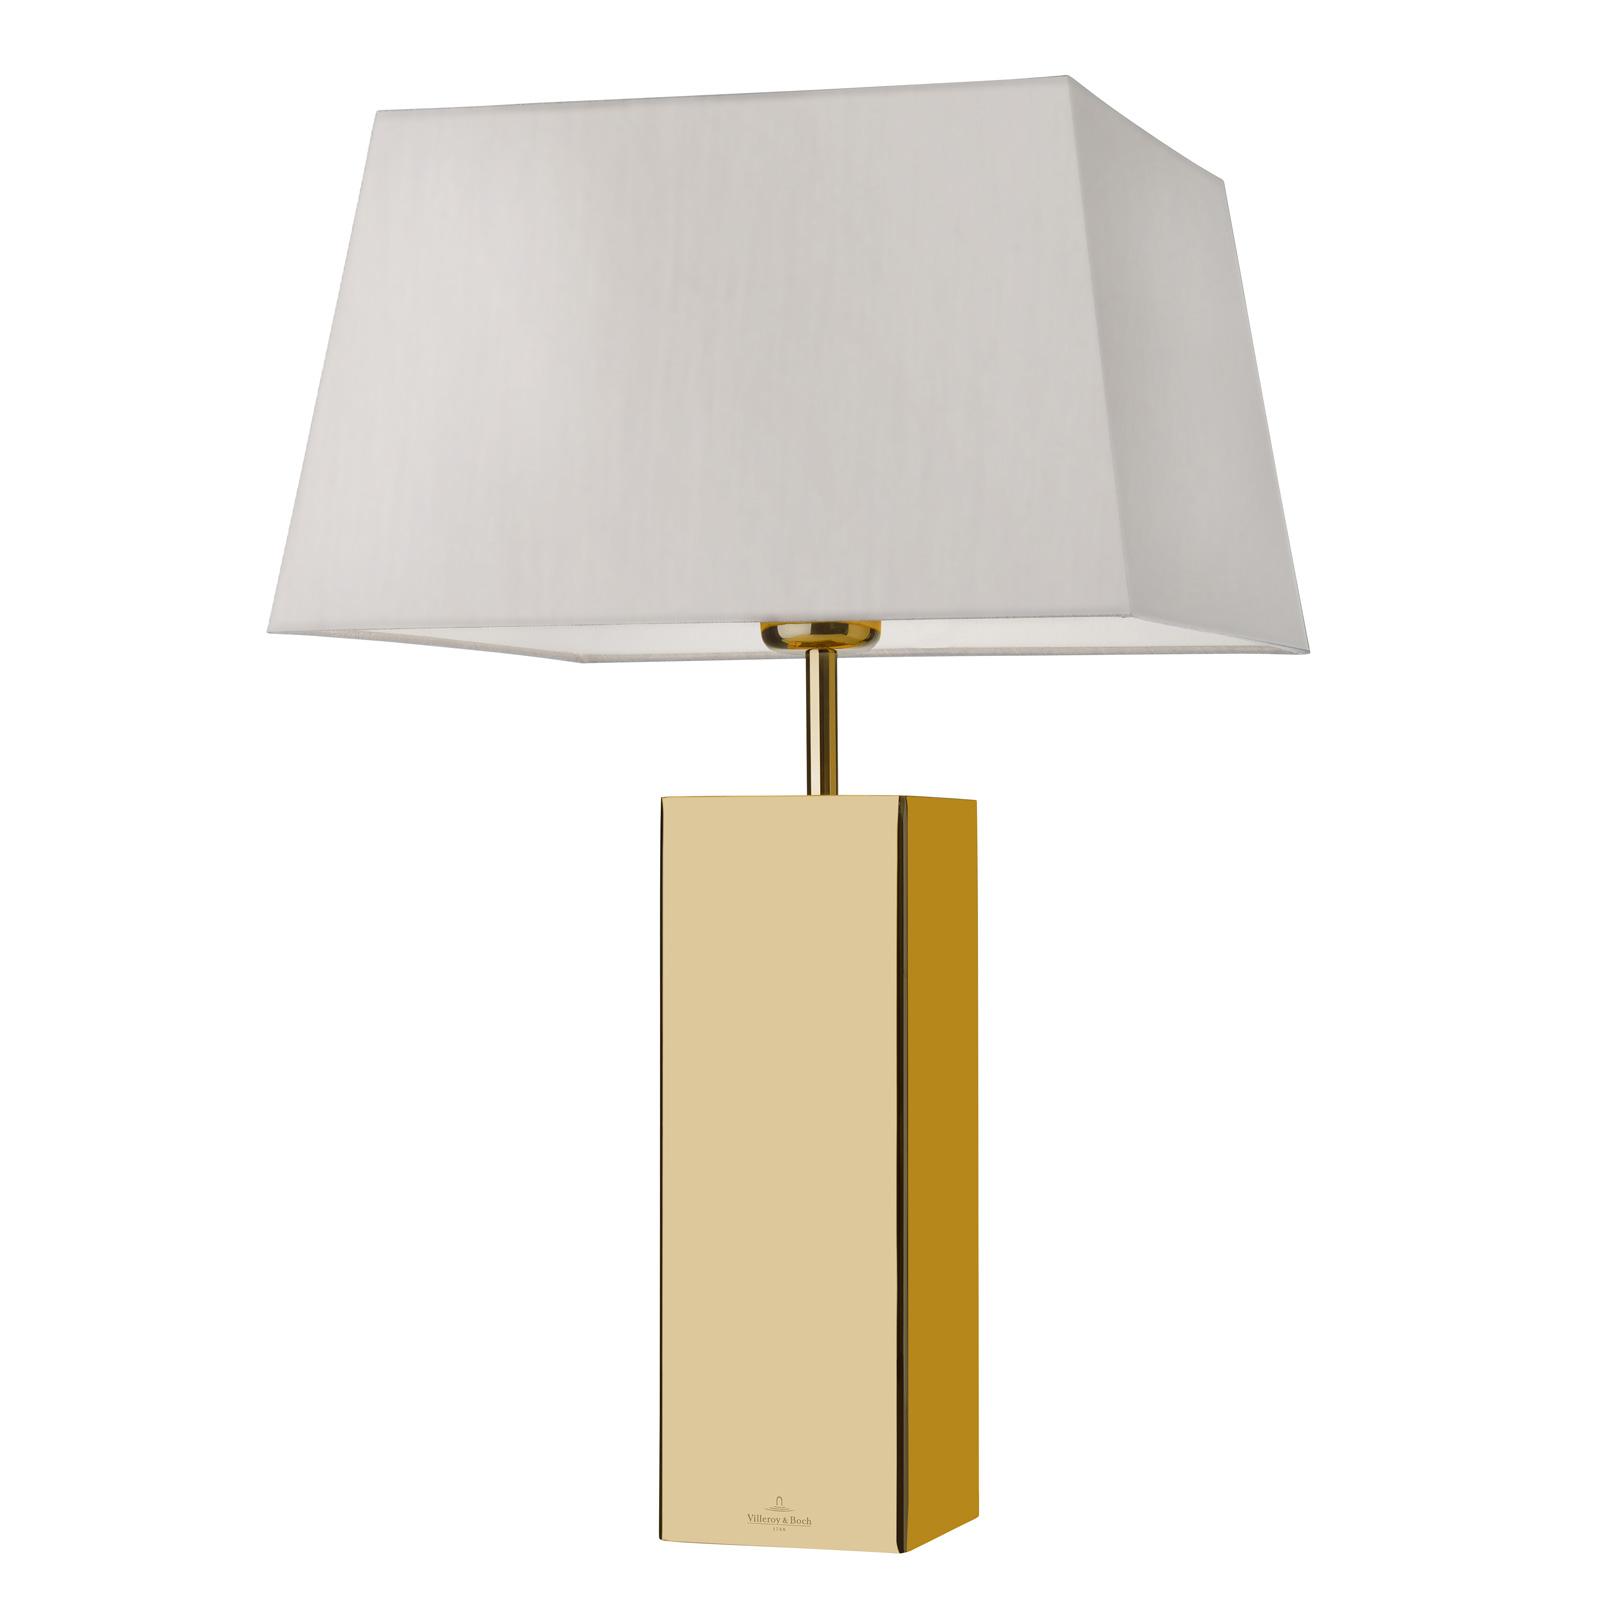 Villeroy & Boch Praag tafellamp in goudlook